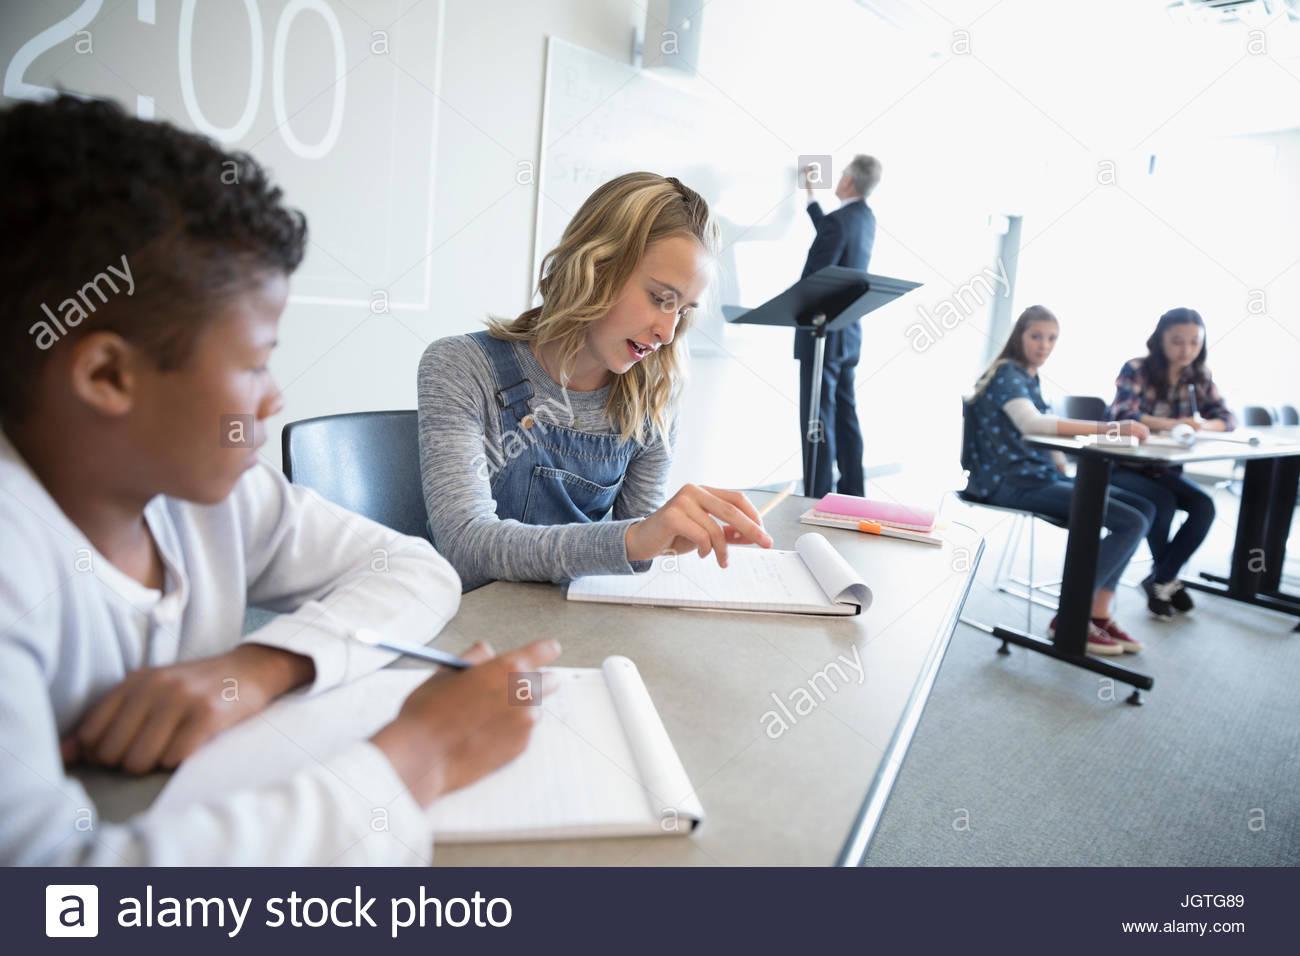 Middle school students talking in debate club in classroom - Stock Image